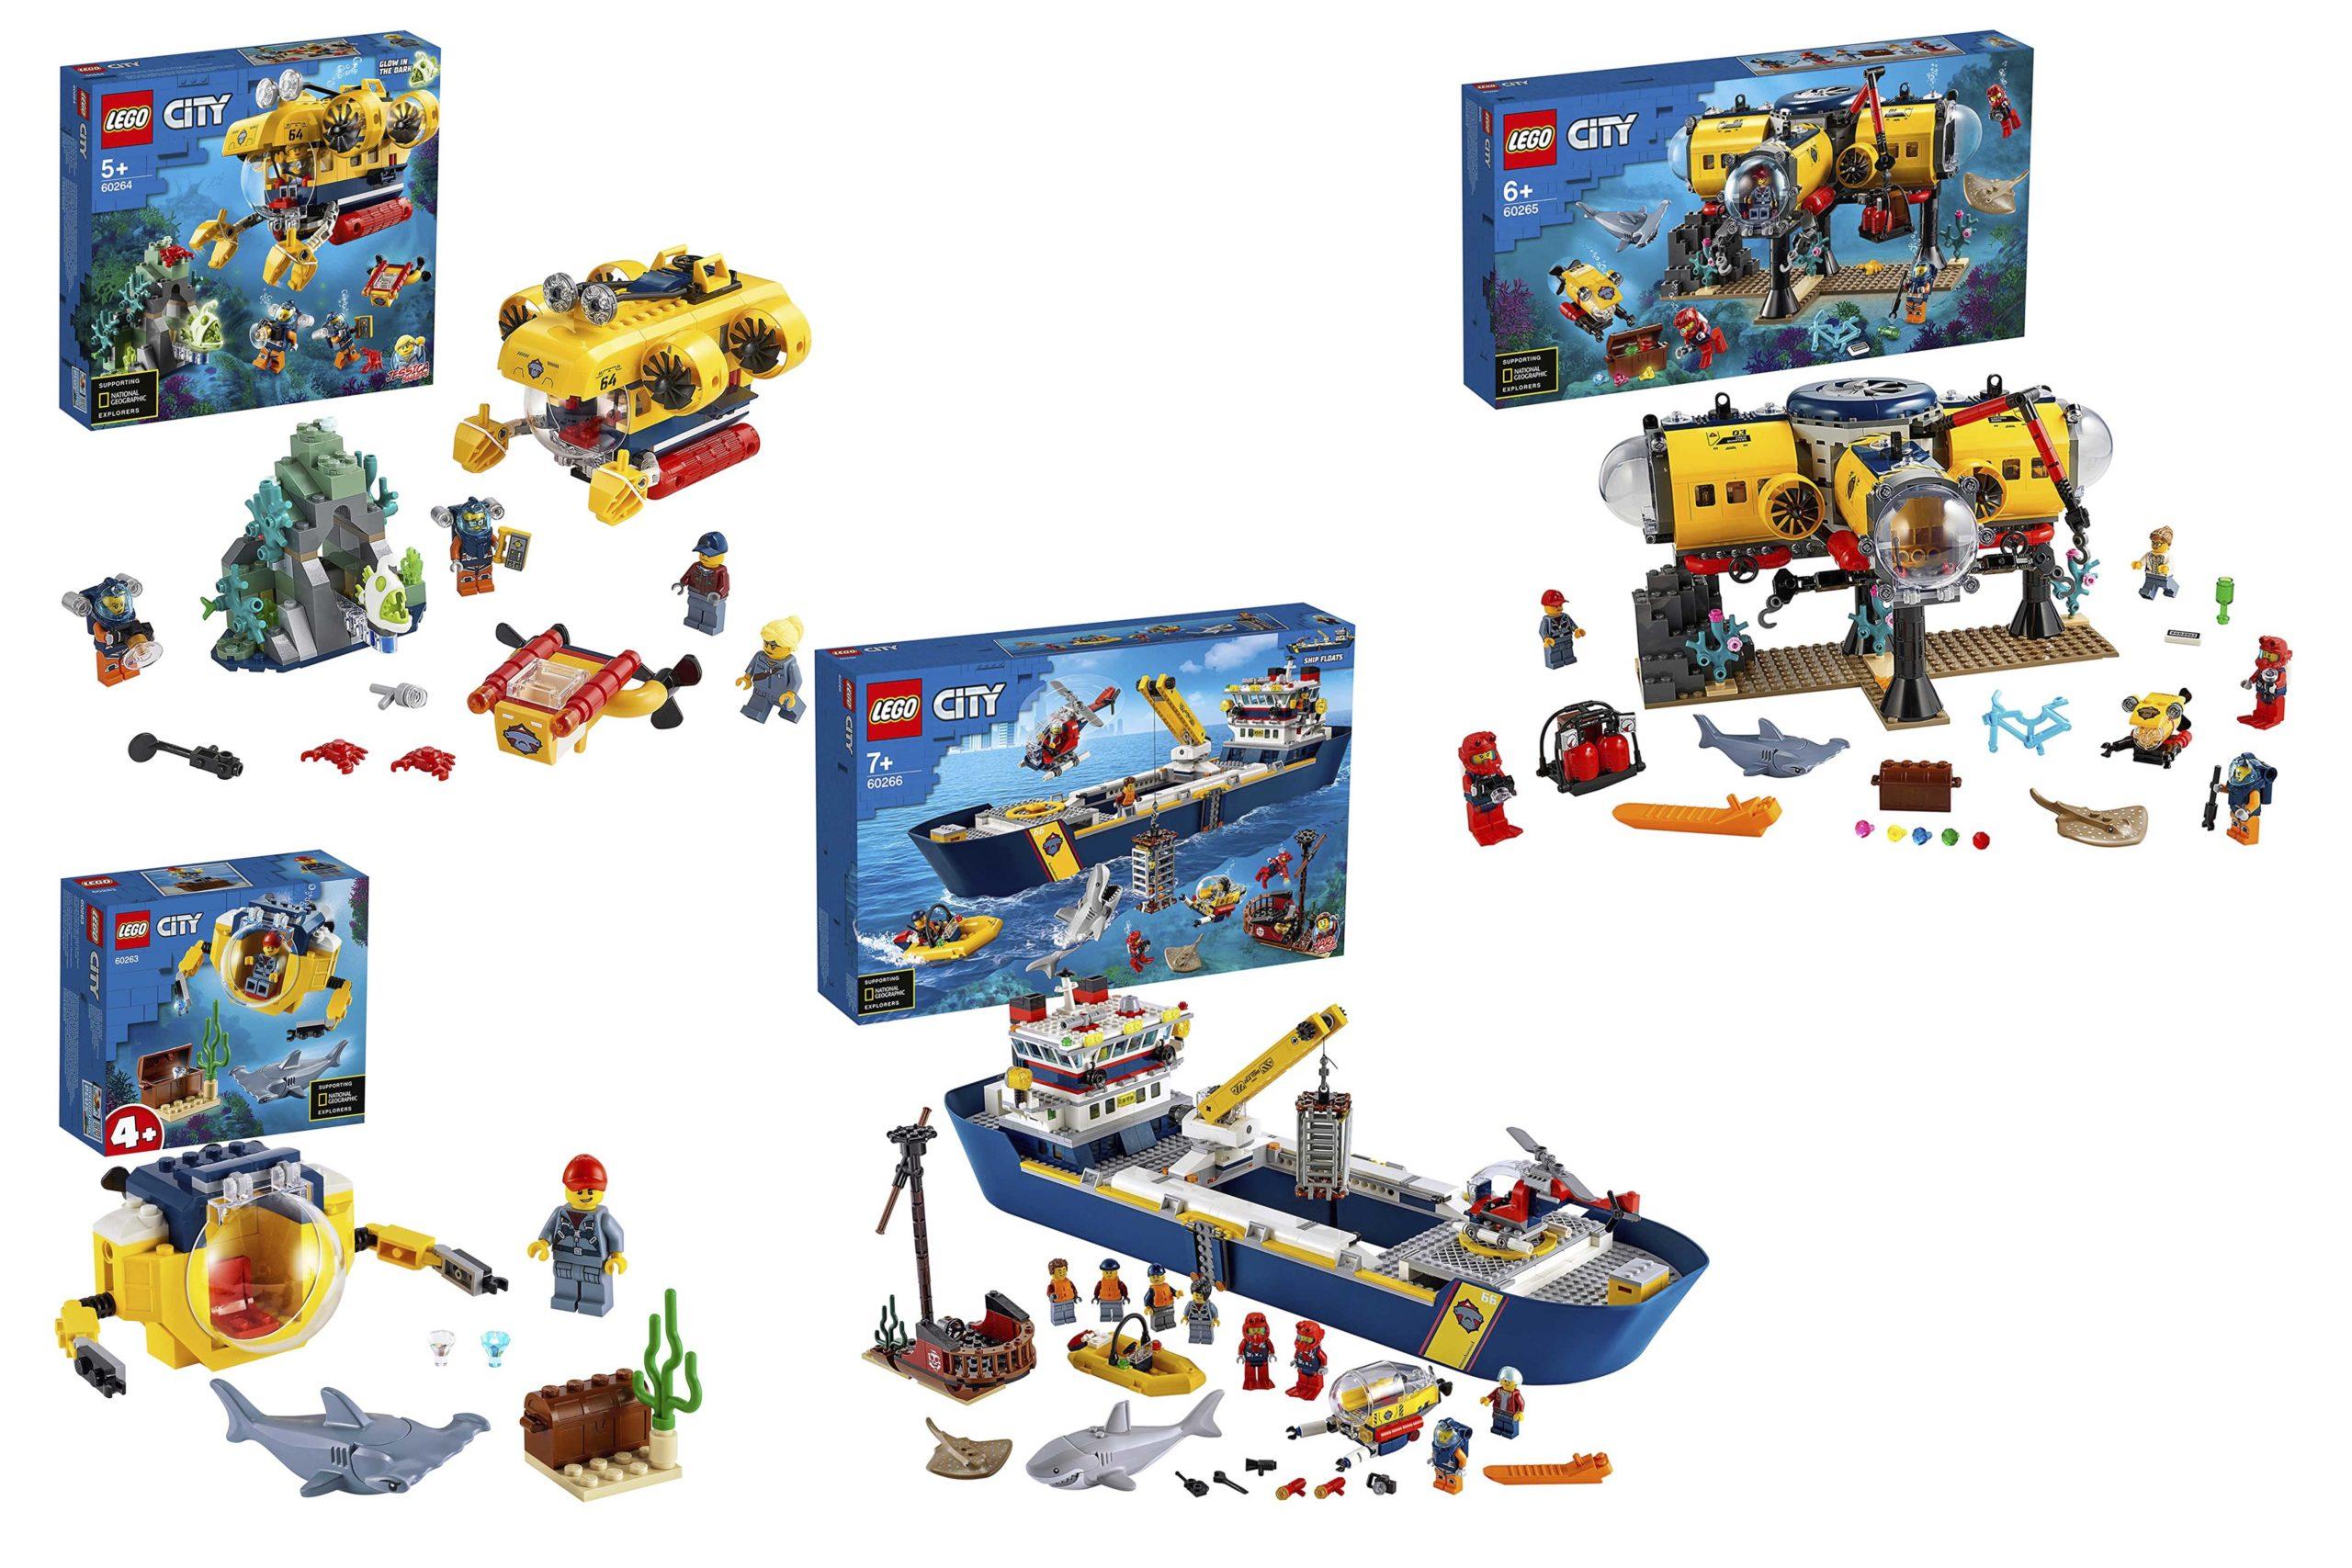 LEGO City Ocean Exploration - Header Image of all sets